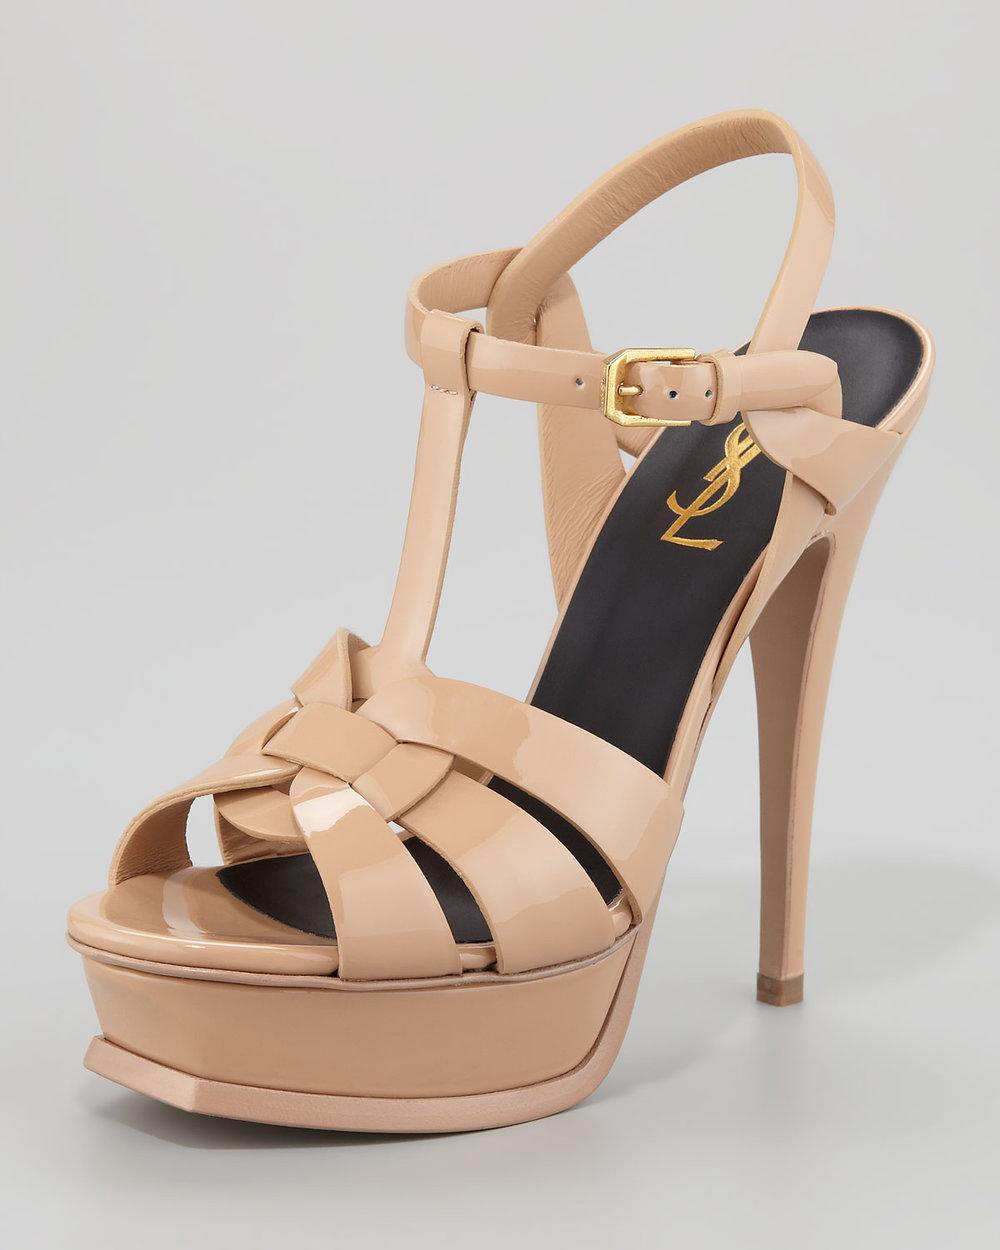 yves-saint-laurent-light-nude-tribute-patent-leather-platform-sandal-product-1-5981039-383939128.jpeg